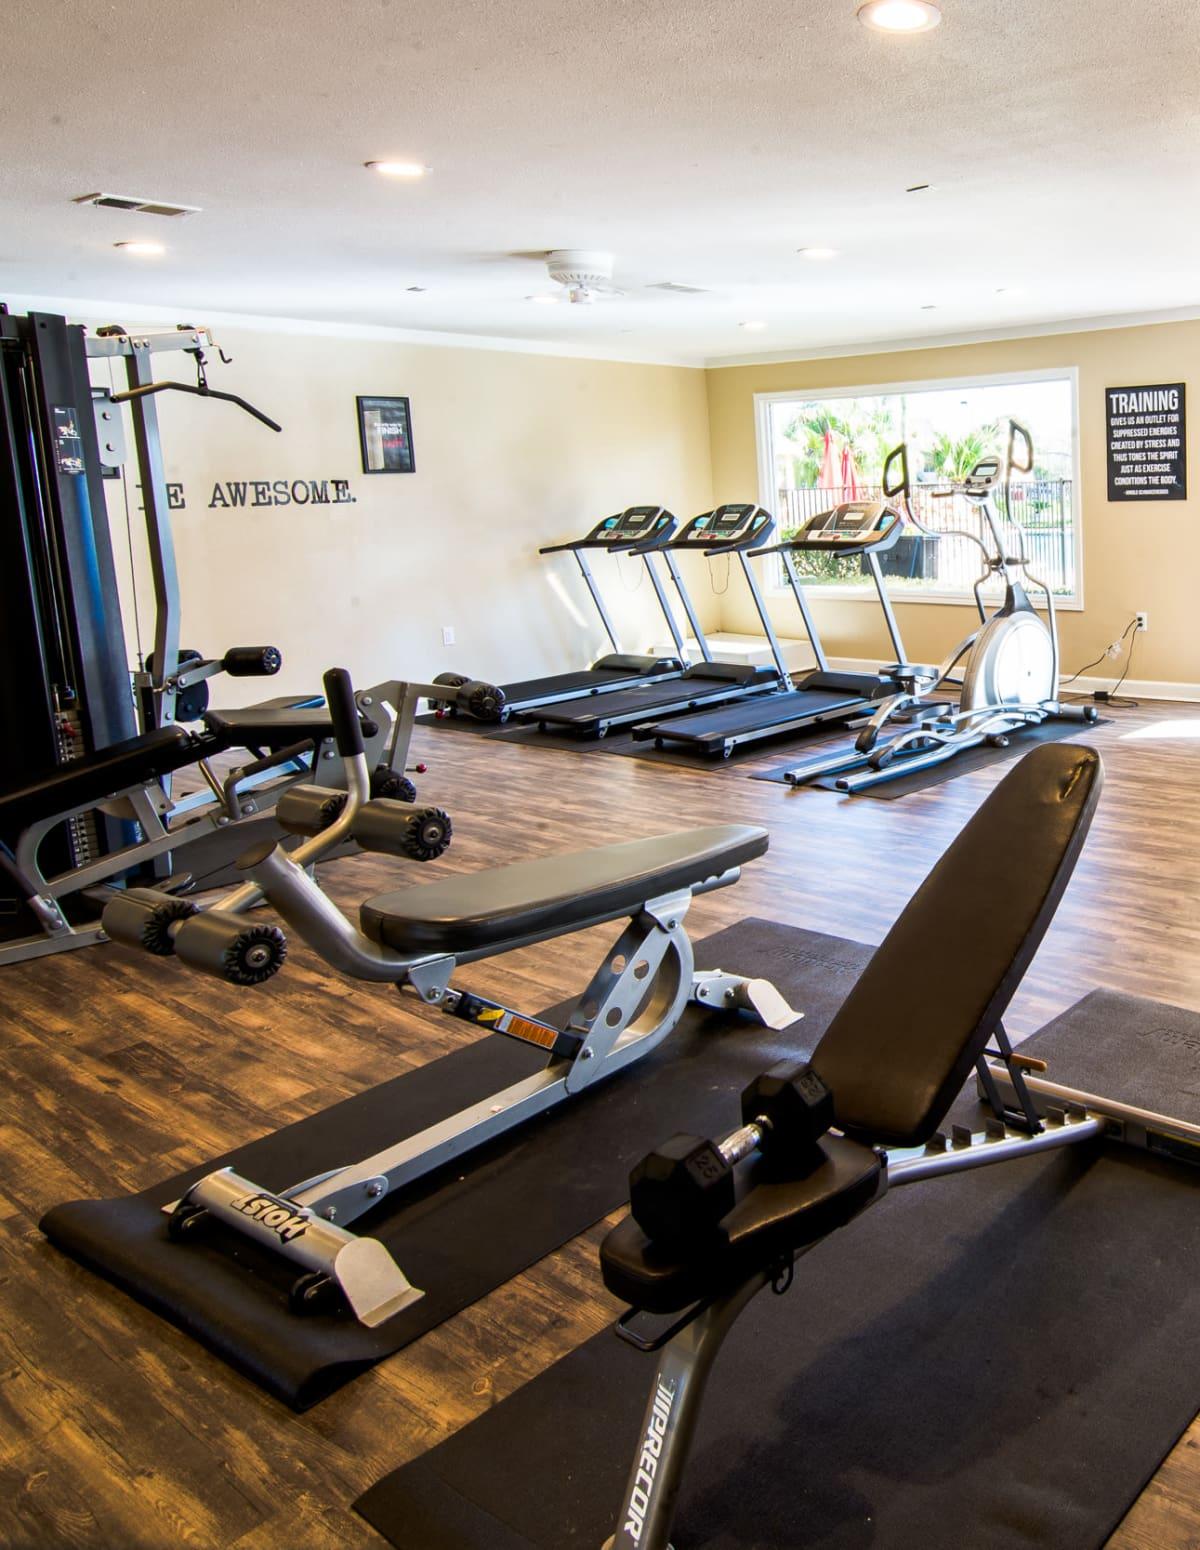 Reserve on Garth Road fitness center